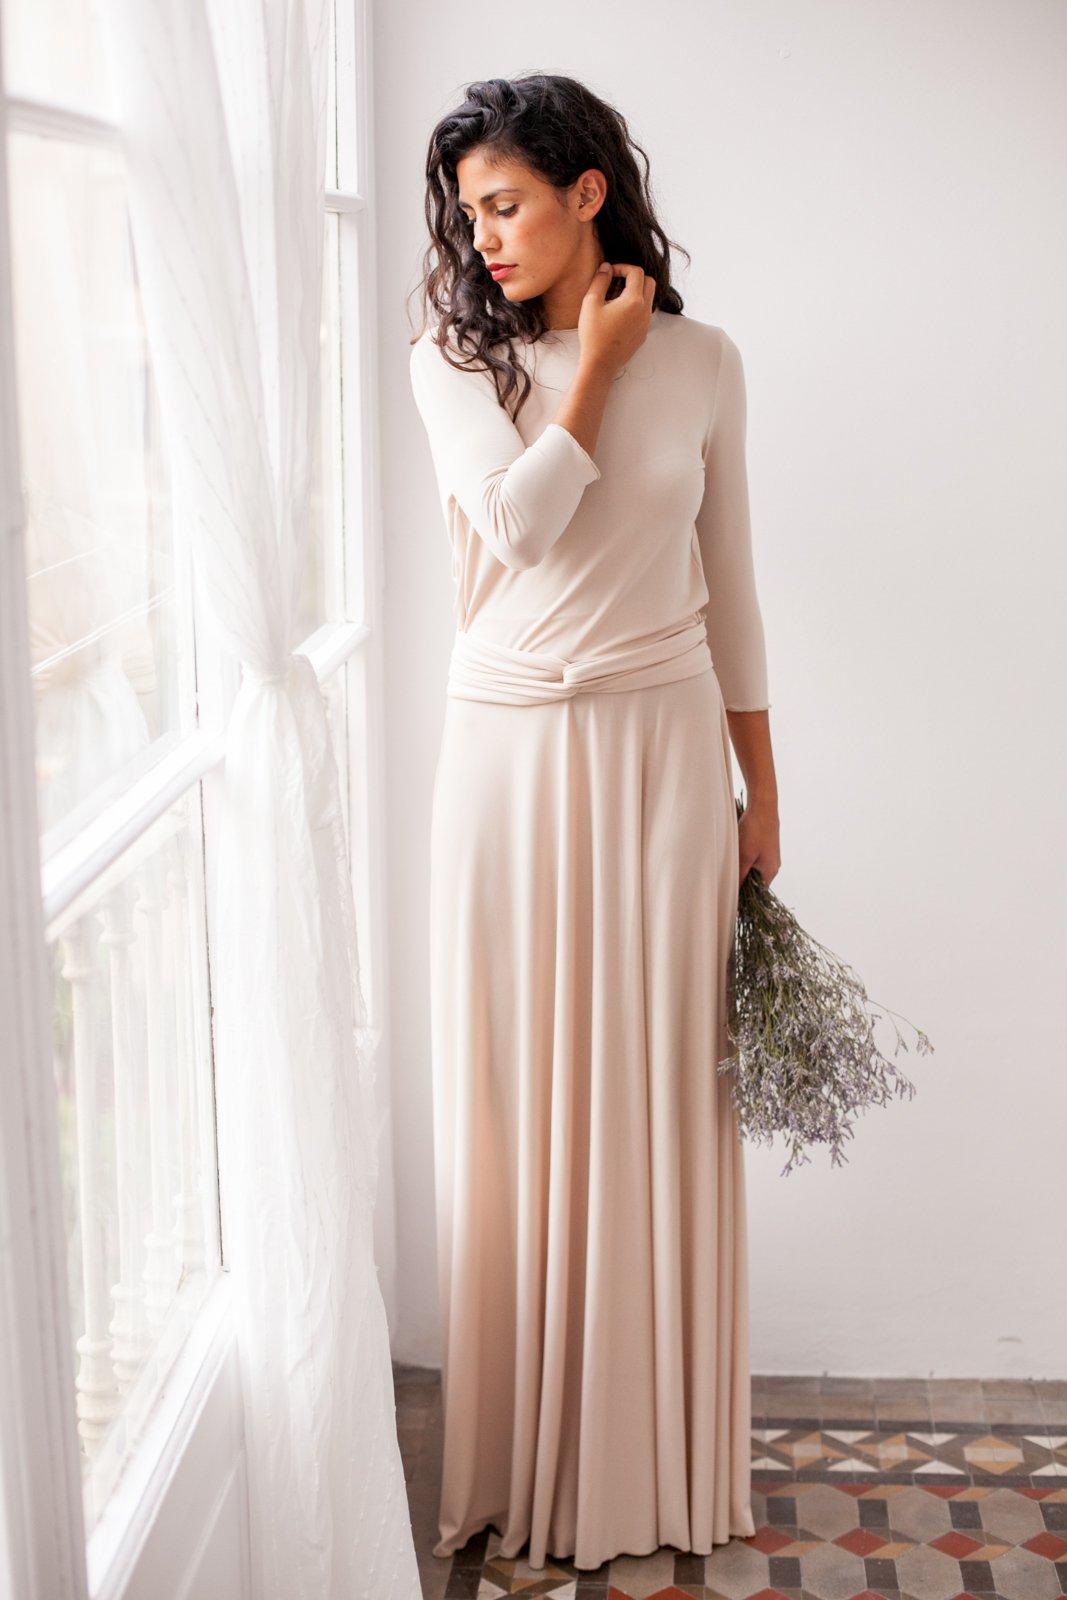 Champagne wedding dress, long sleeve wedding dress, romantic beige long dress, long sleeve wrap dress, beige long dress, mimetik bcn dresses